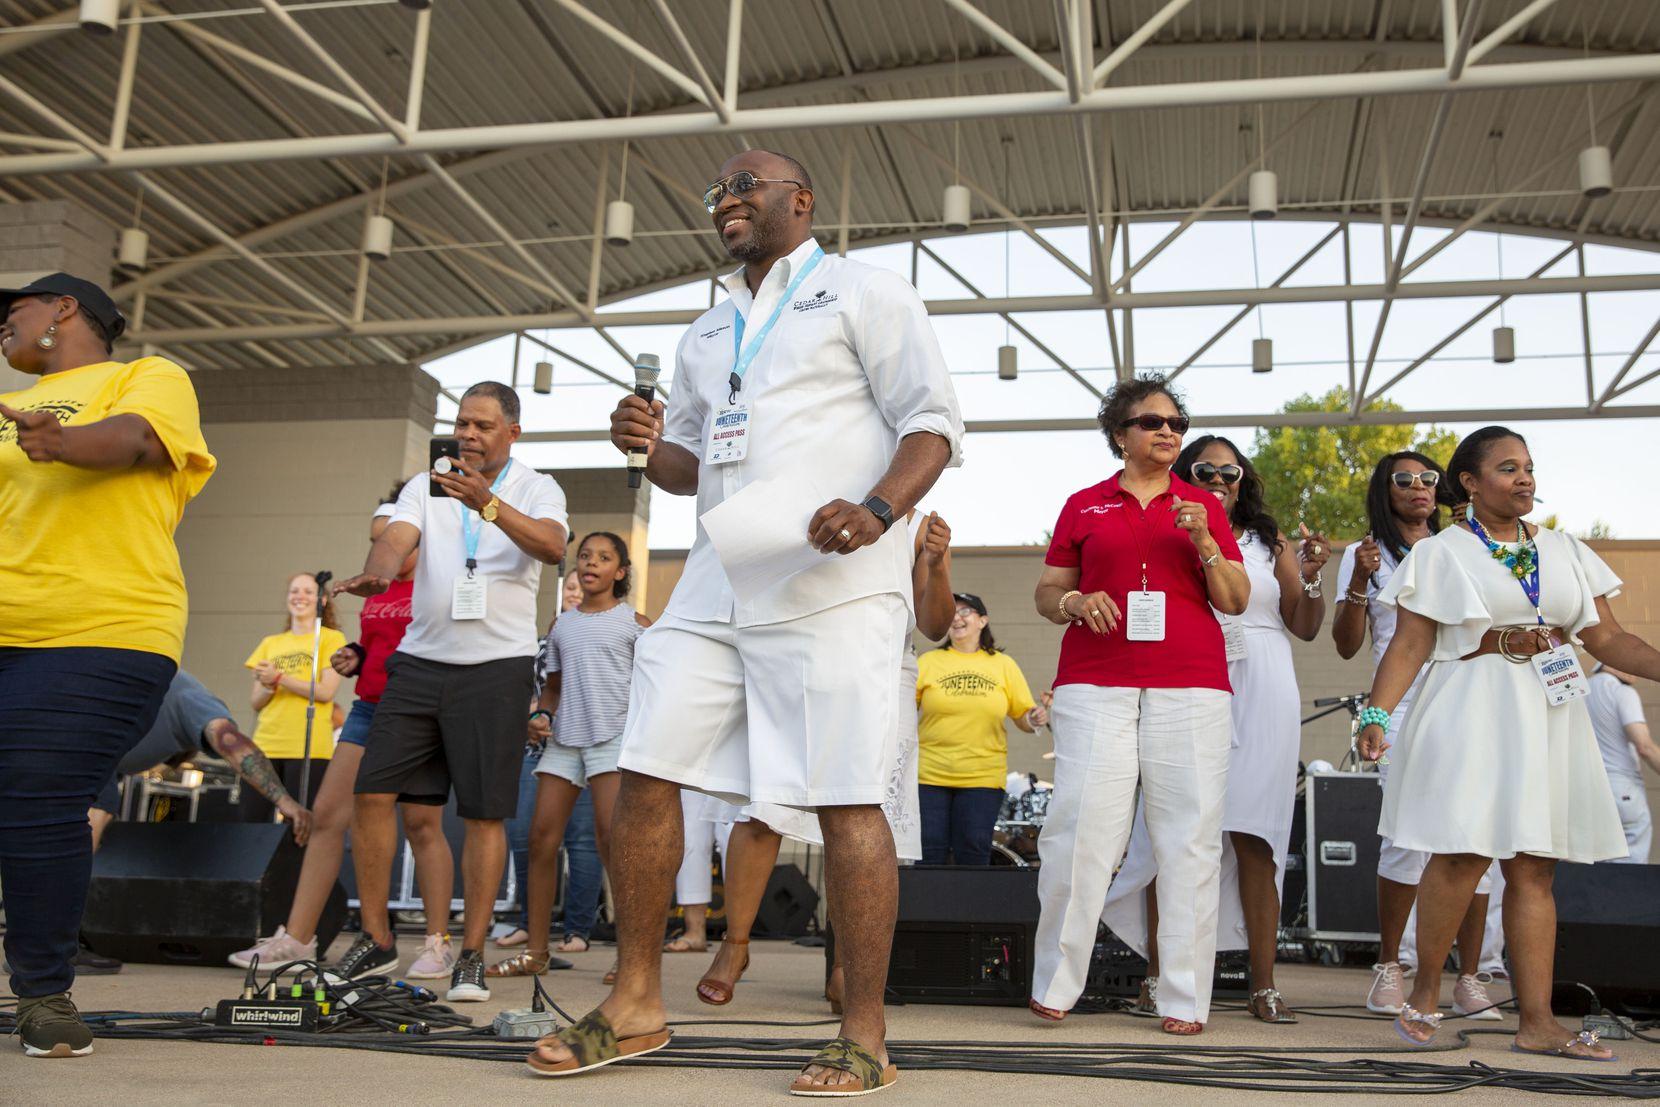 Cedar Hill mayor Stephen Mason (center) dances at the Best Southwest Juneteenth Celebration in 2019.